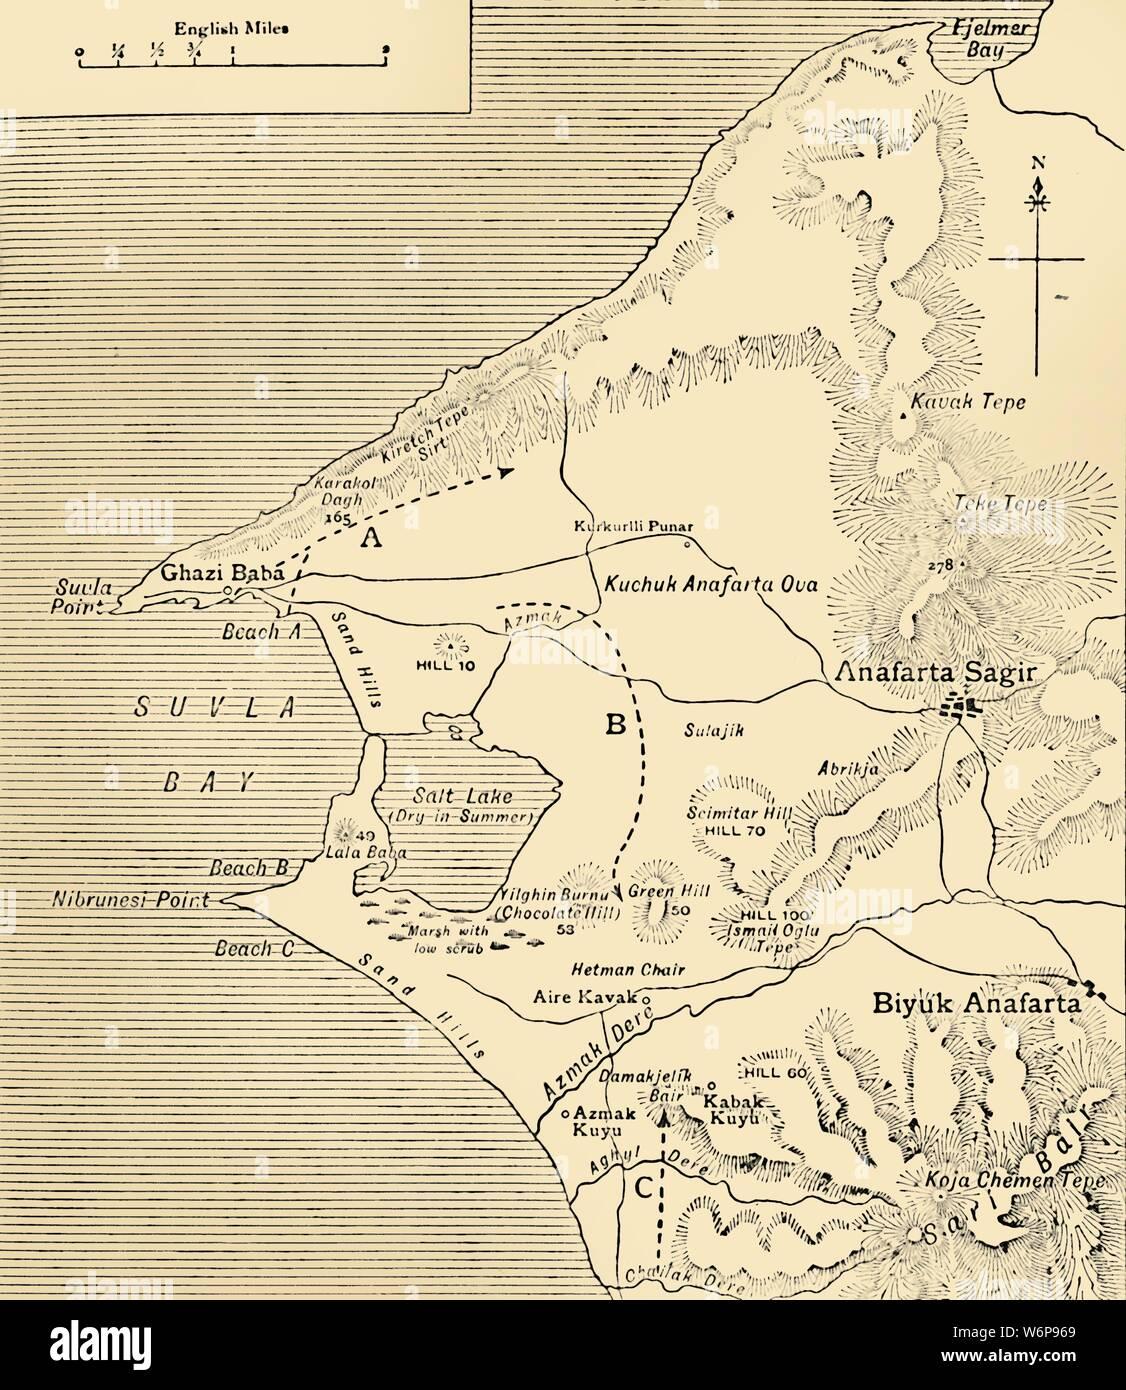 Map of Suvla Bay, Gallipoli peninsula, First World War, 1915 ... Gallipoli Map on battle of verdun map, tannenberg map, benevento map, bosporus map, aegean sea map, troy map, ypres map, greece map, palestine map, western front map, dardanelles map, australia map, florence map, balkan peninsula map, world map, suvla bay map, messina map, hundred days offensive map, italian front map, antalya map,